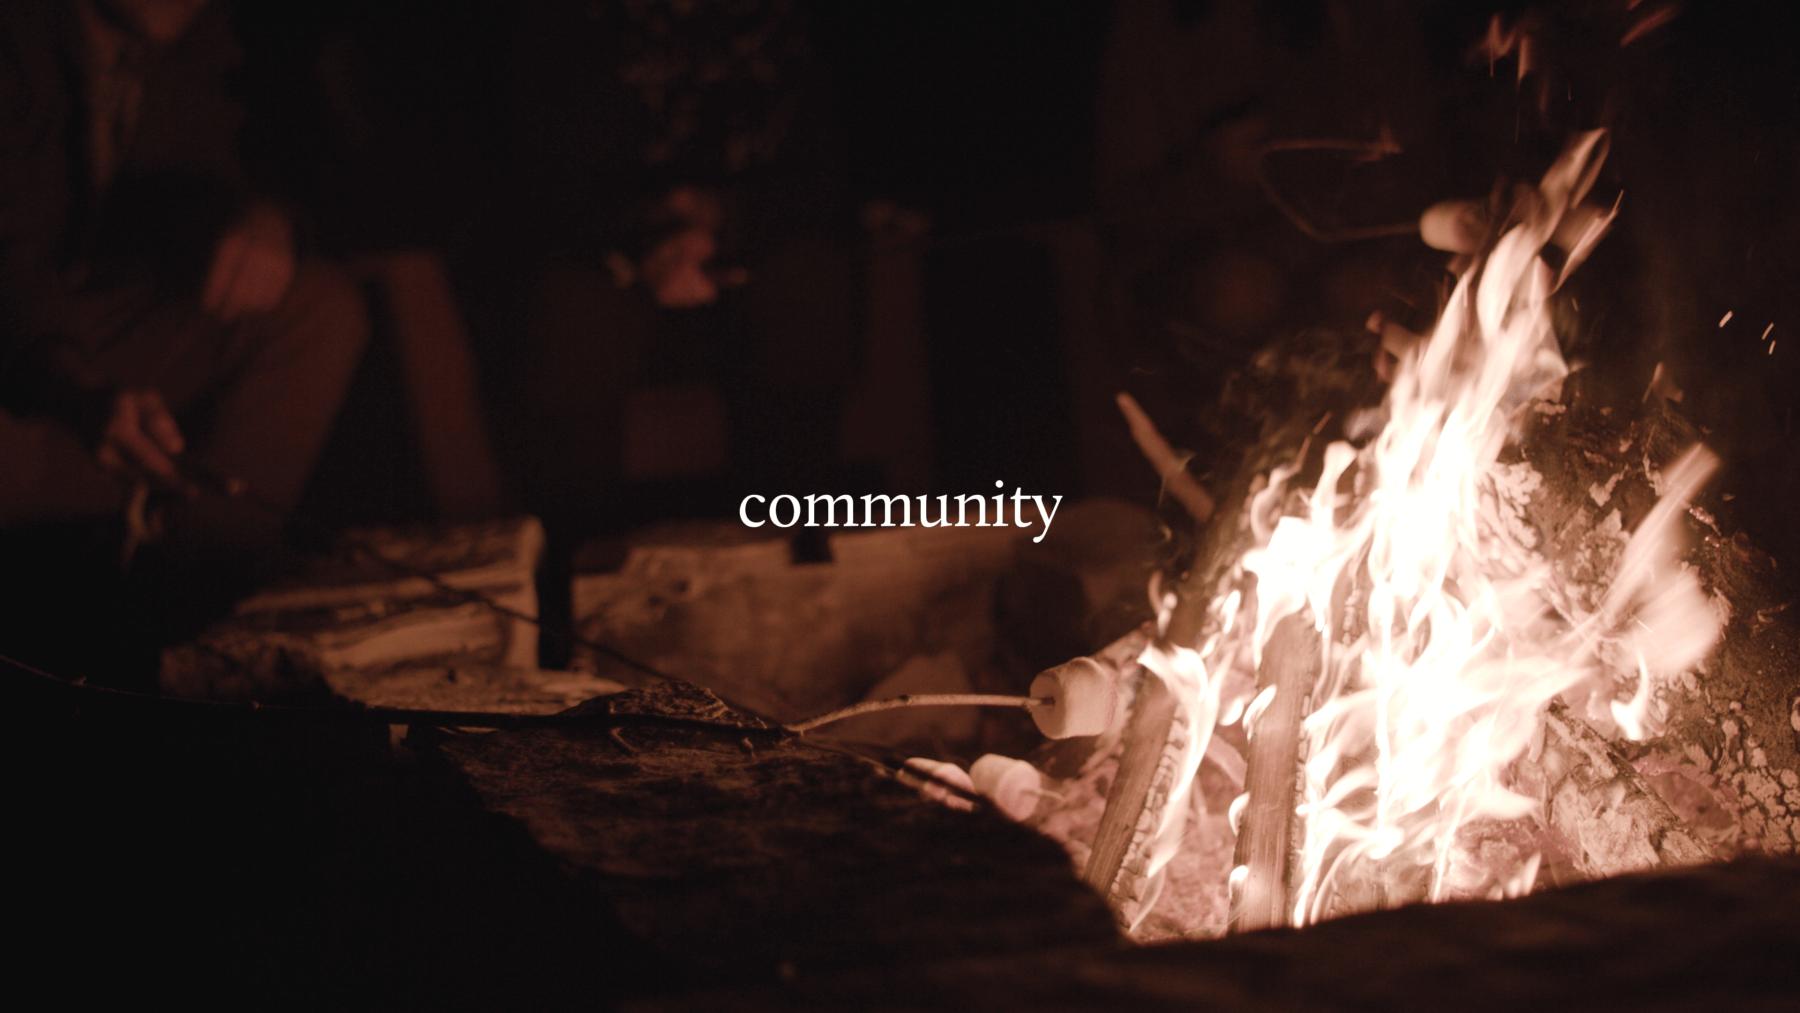 Sermon Series Ideas #6: Community